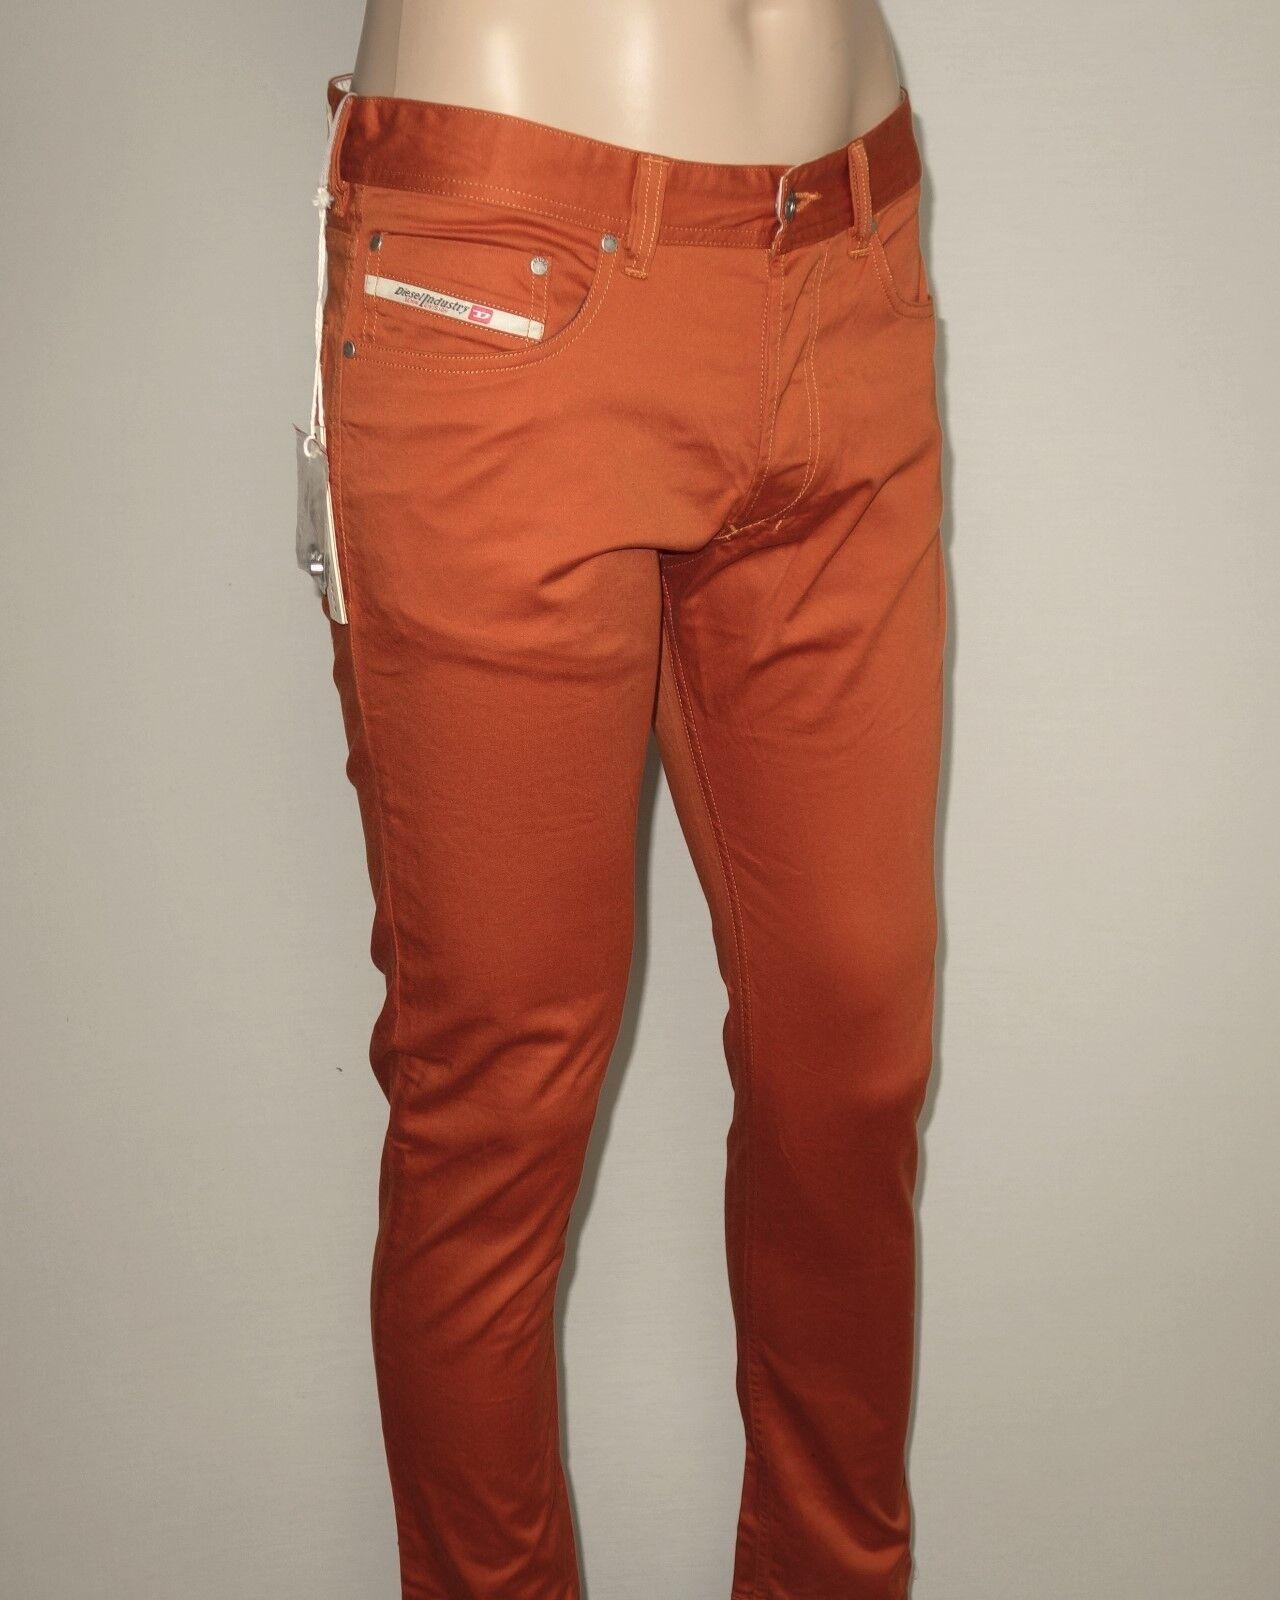 NEW Diesel TEPPHAR-A Trousers in orange W26xL30 Slim-Carred MSRP